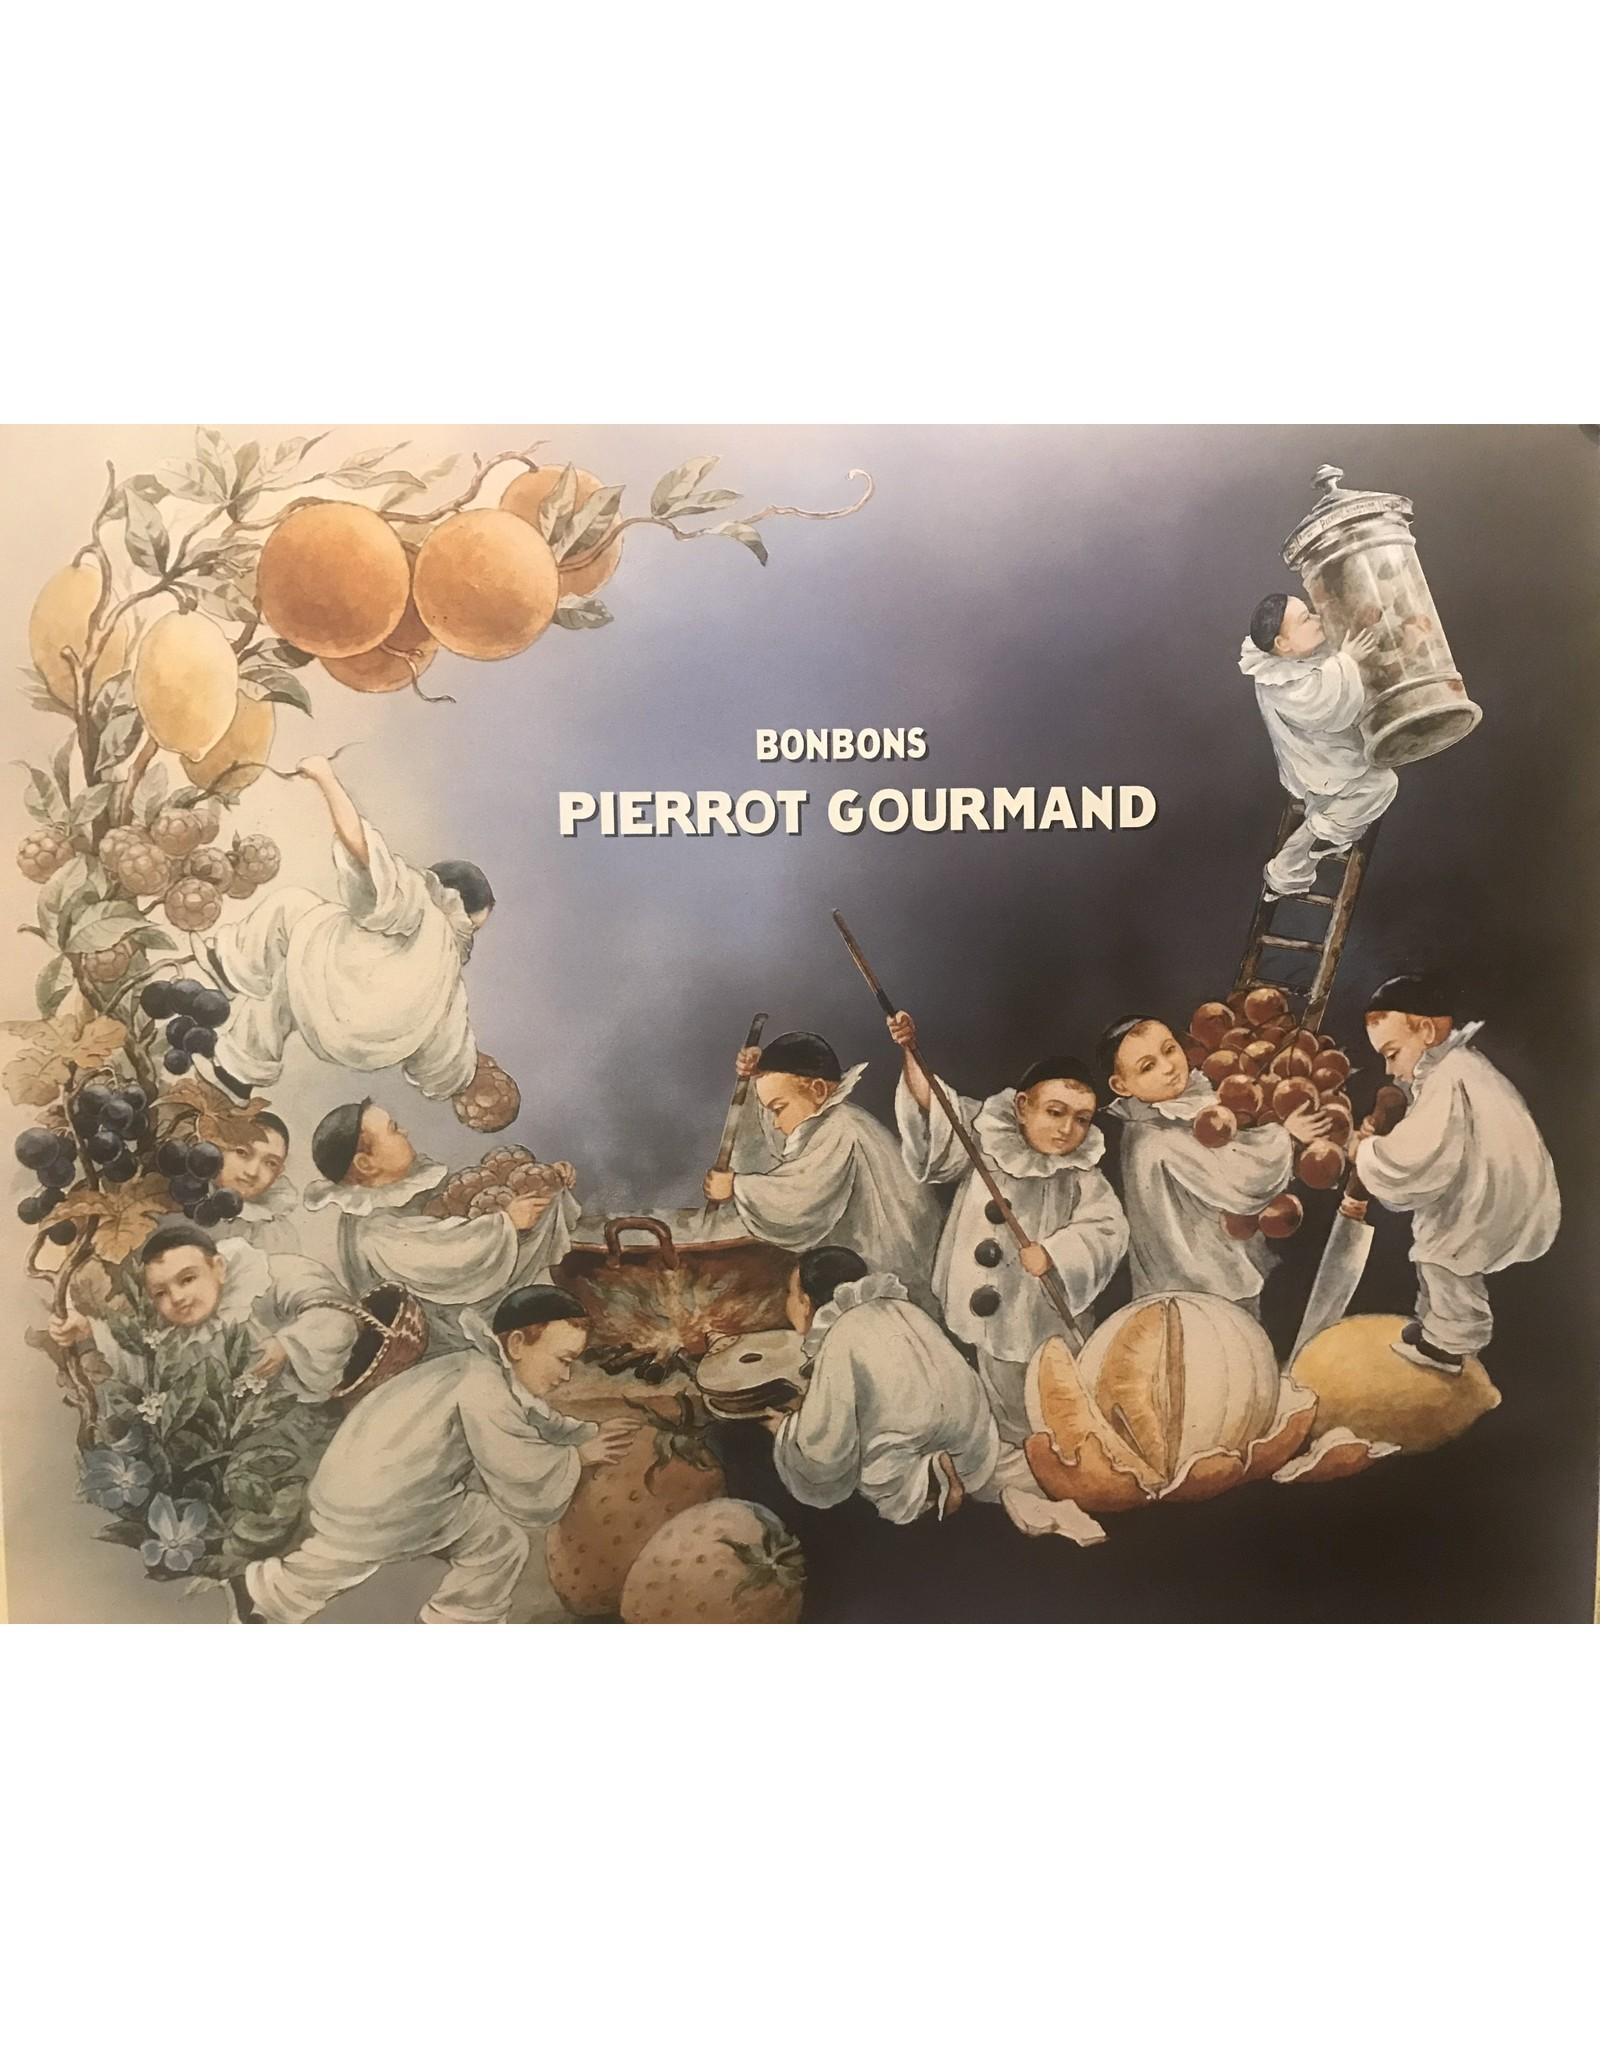 SPV BONBONS Pierrot Gourmand Poster